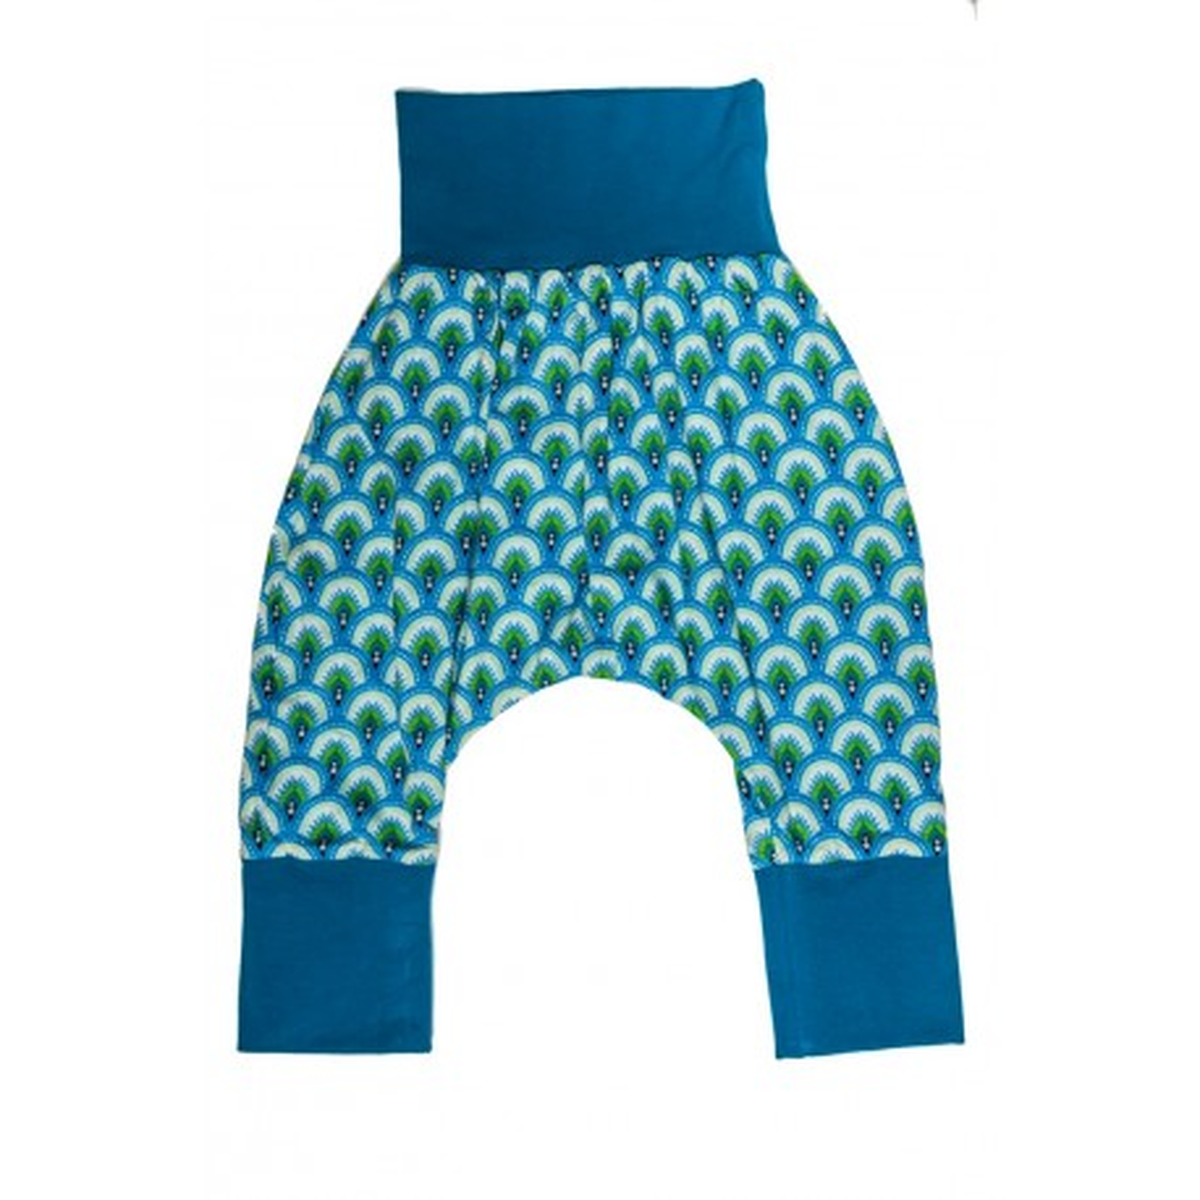 Sarouel bébé 6-24 mois coton bleu